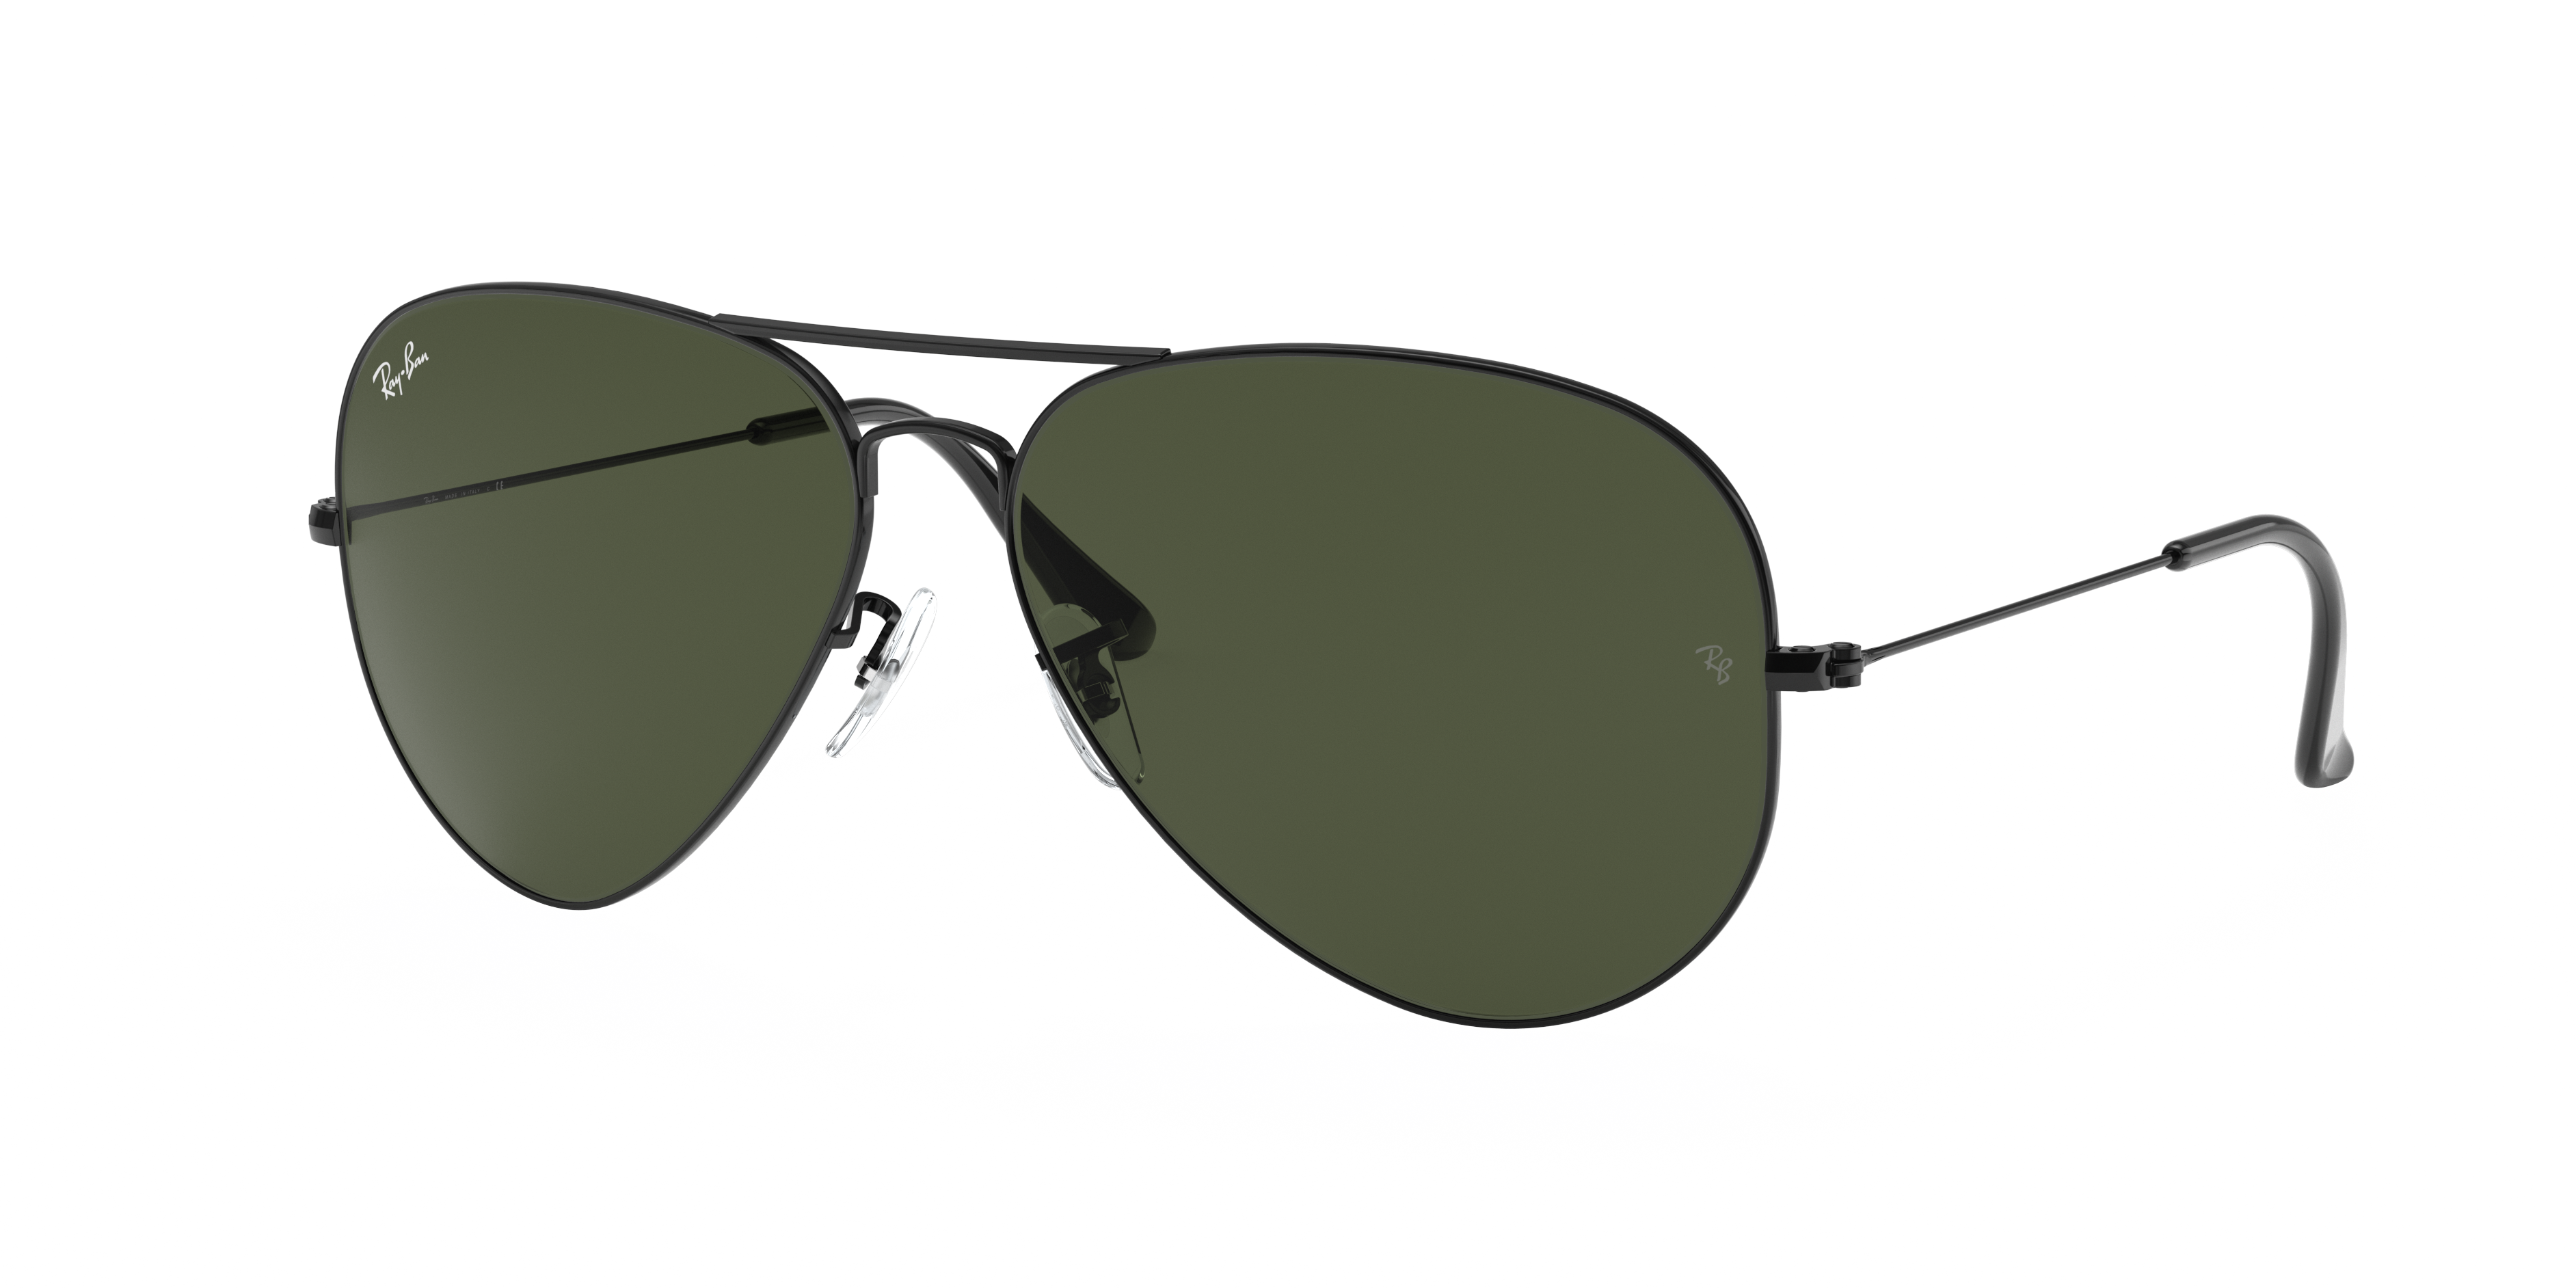 Ray-Ban Aviator Classic Black, Green Lenses - RB3026